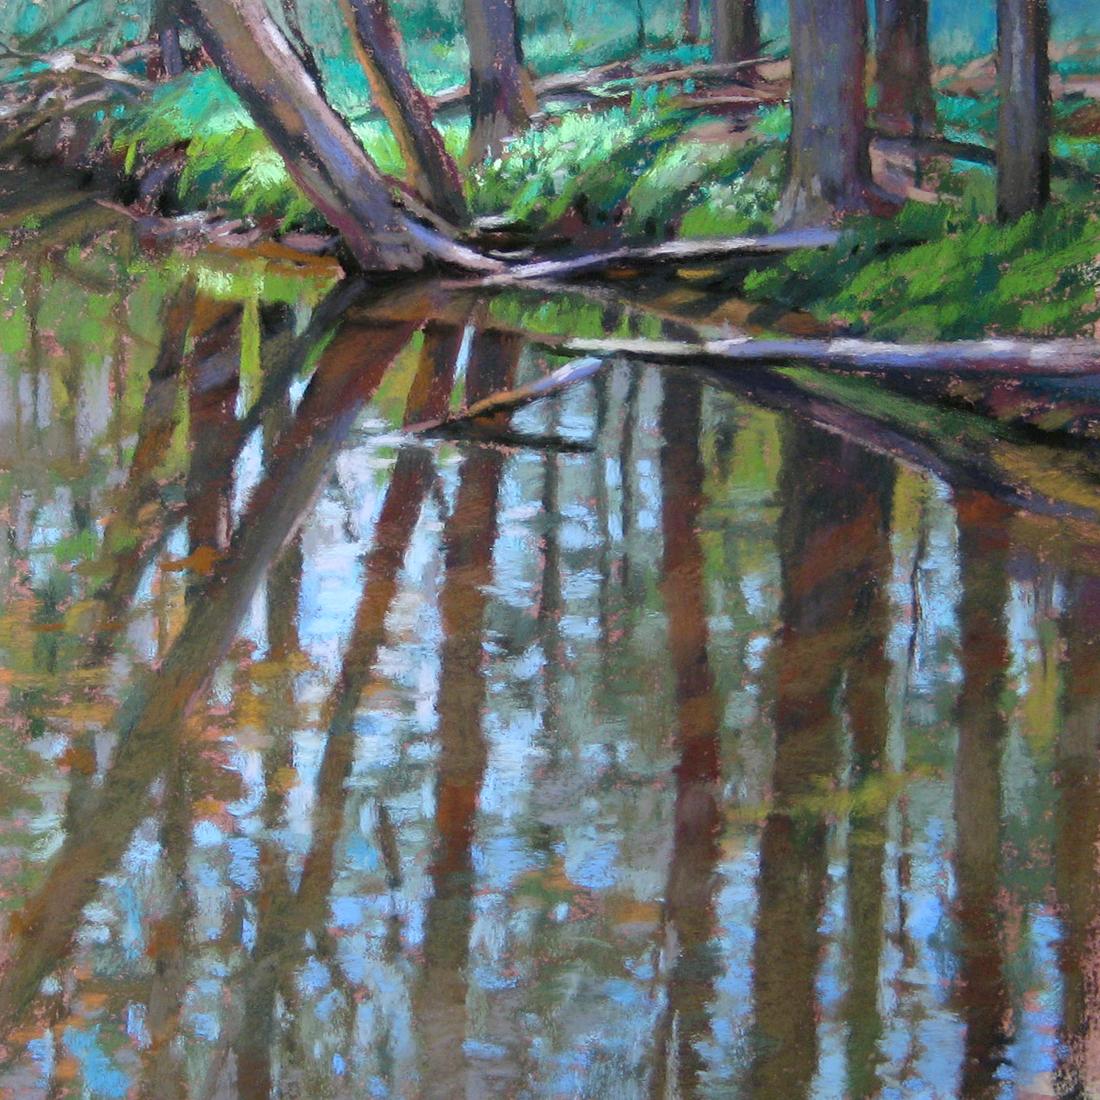 Jill Stefani Wagner - Reflected Woods